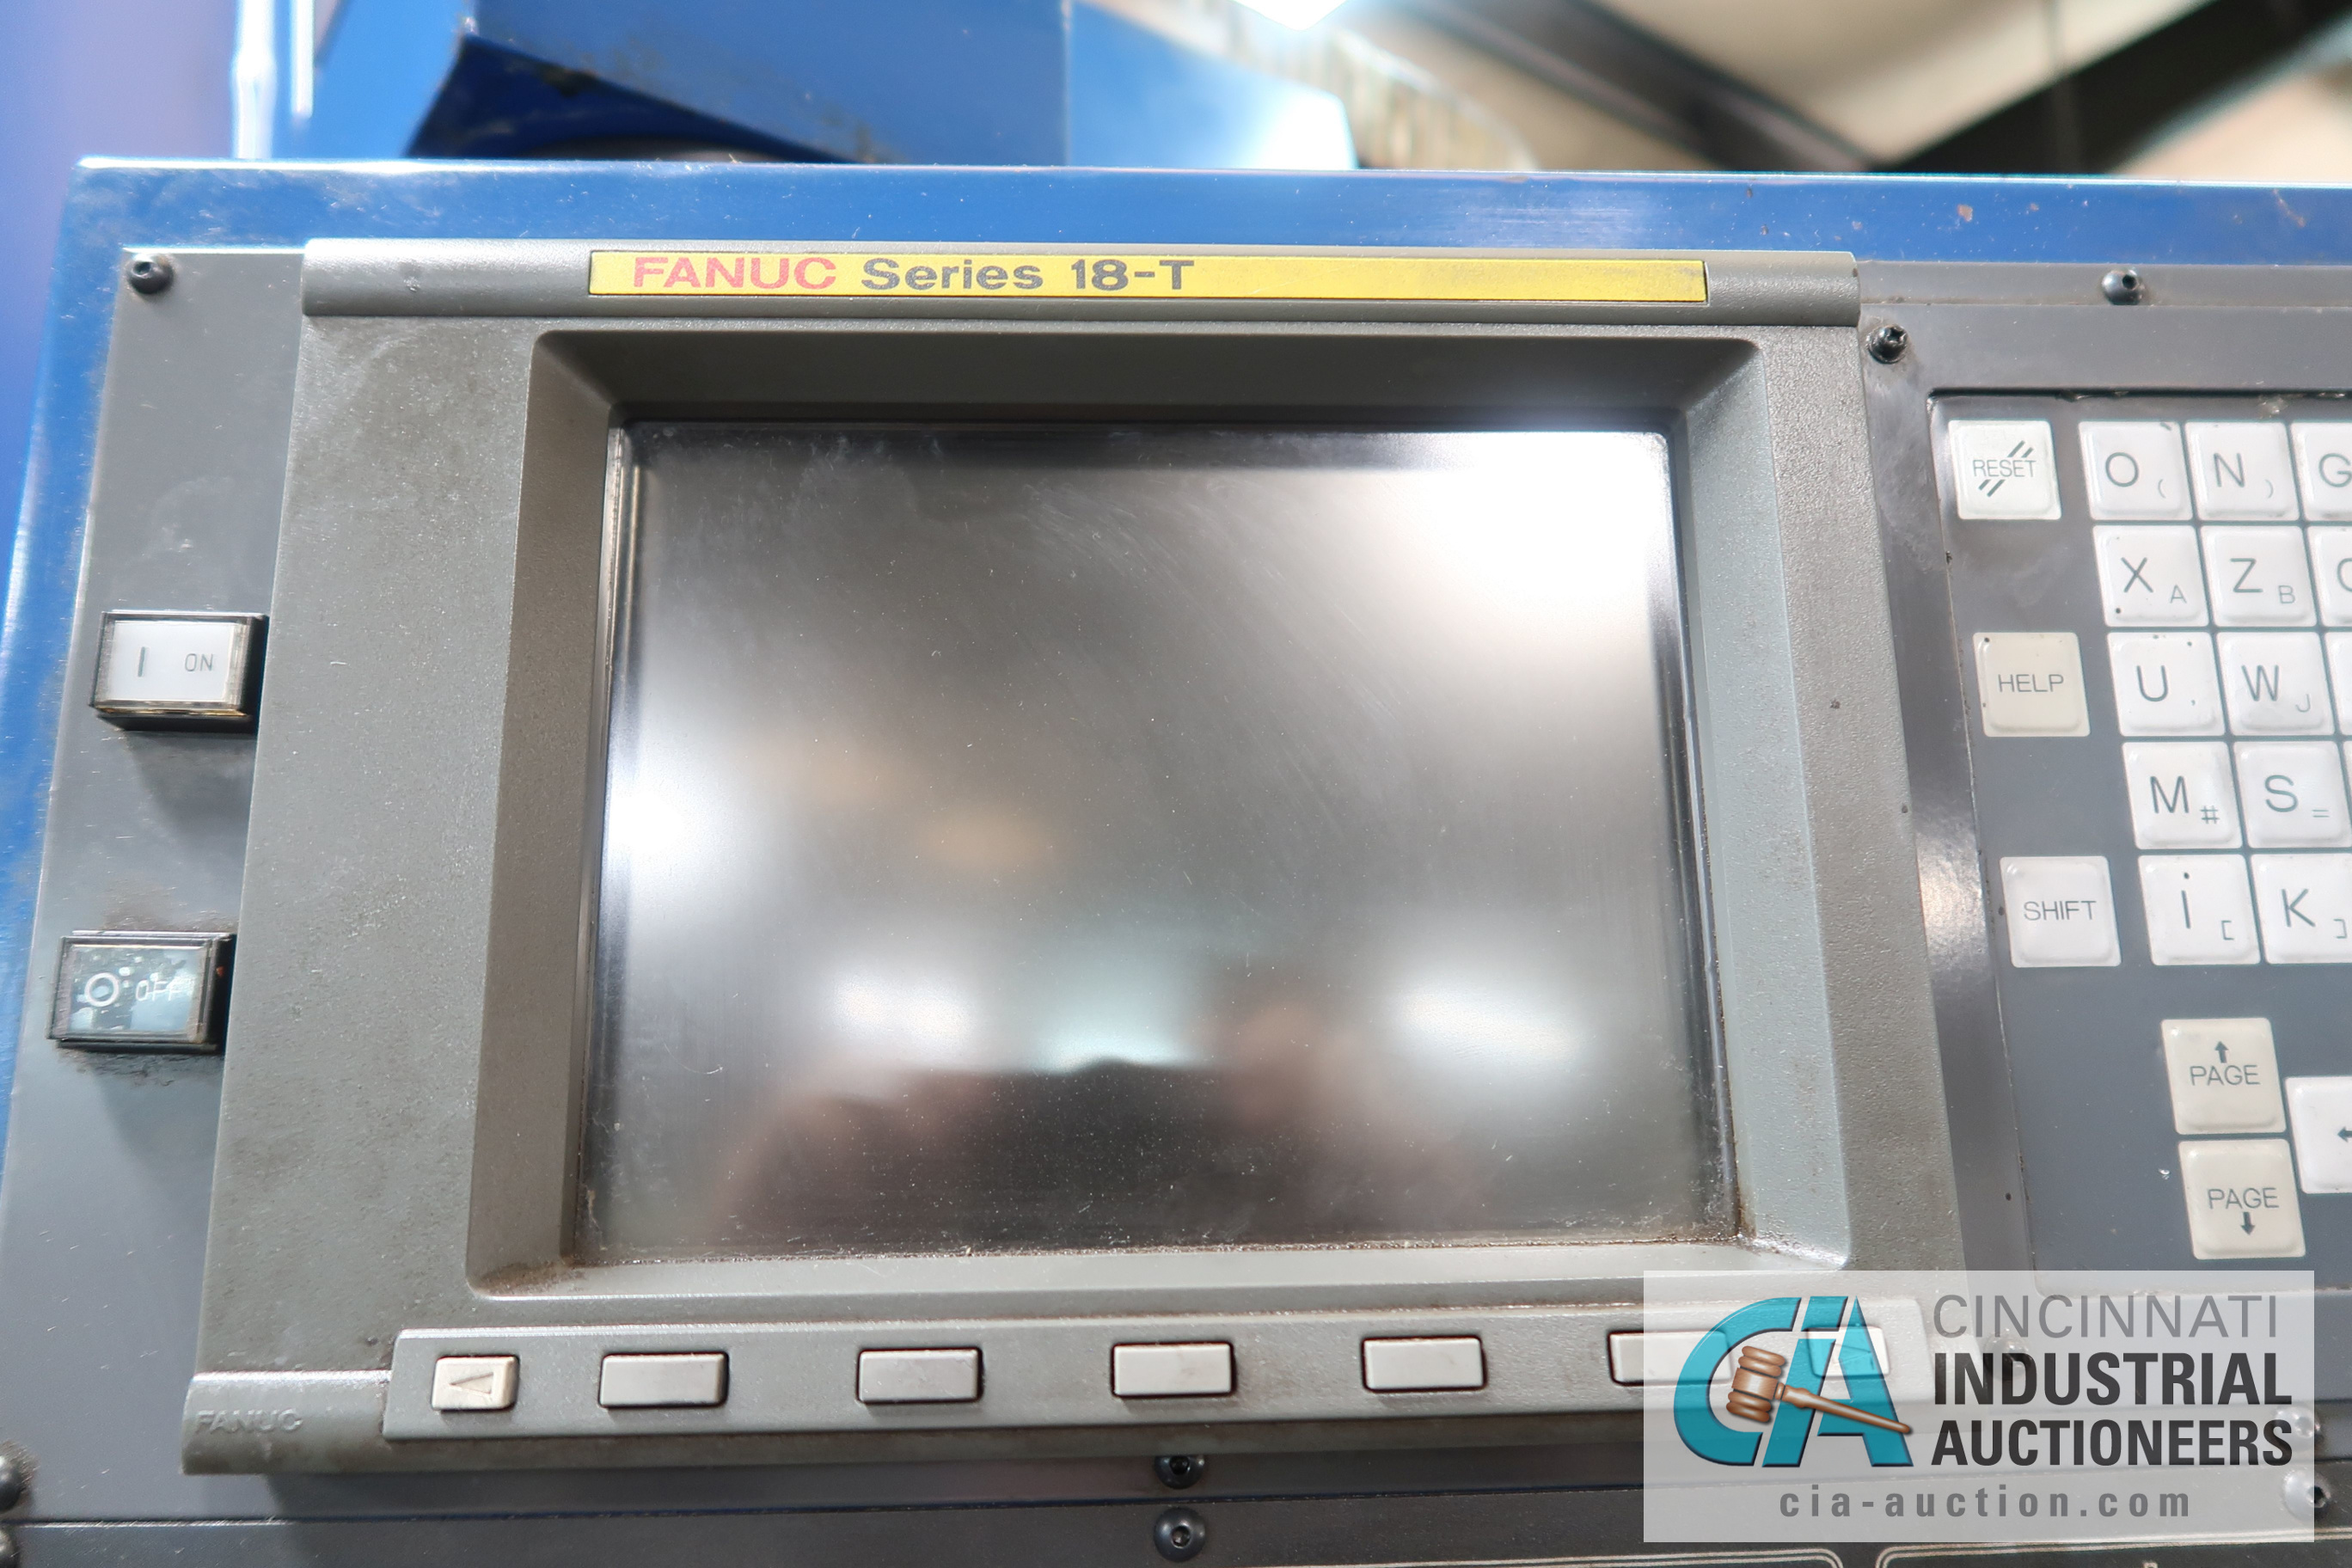 "JOHNFORD MODEL ST-70 SLANT BED CNC LATHE; S/N TT0013 (NEW 2000), 12"" CHUCK, 36"" SWING OVER BED, - Image 13 of 21"